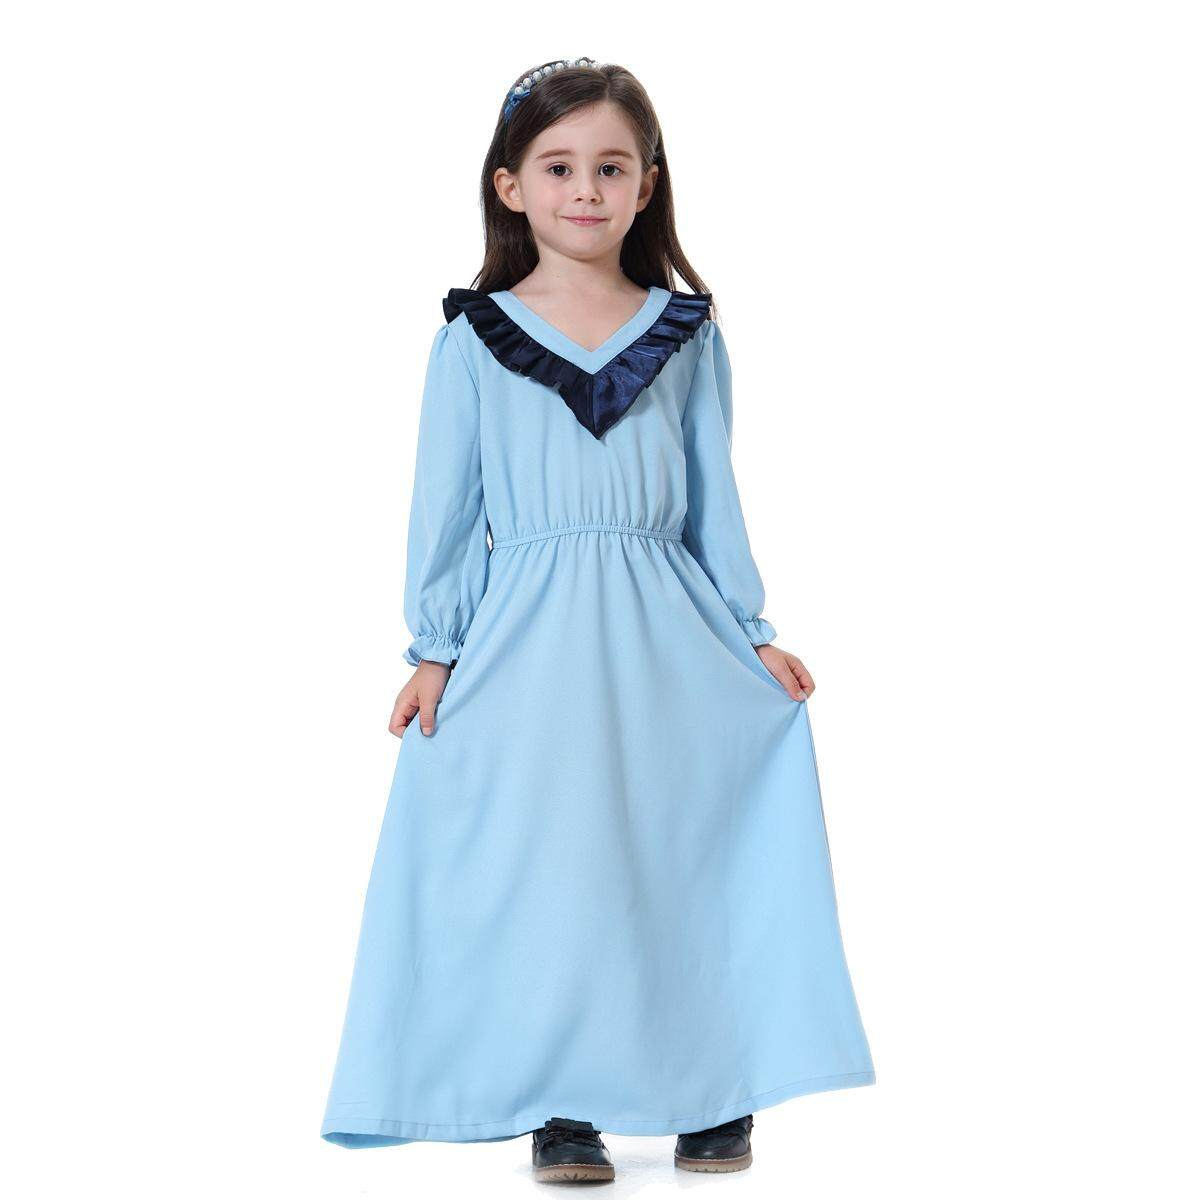 New hot selling Muslim girl long skirt princess sleeve dress